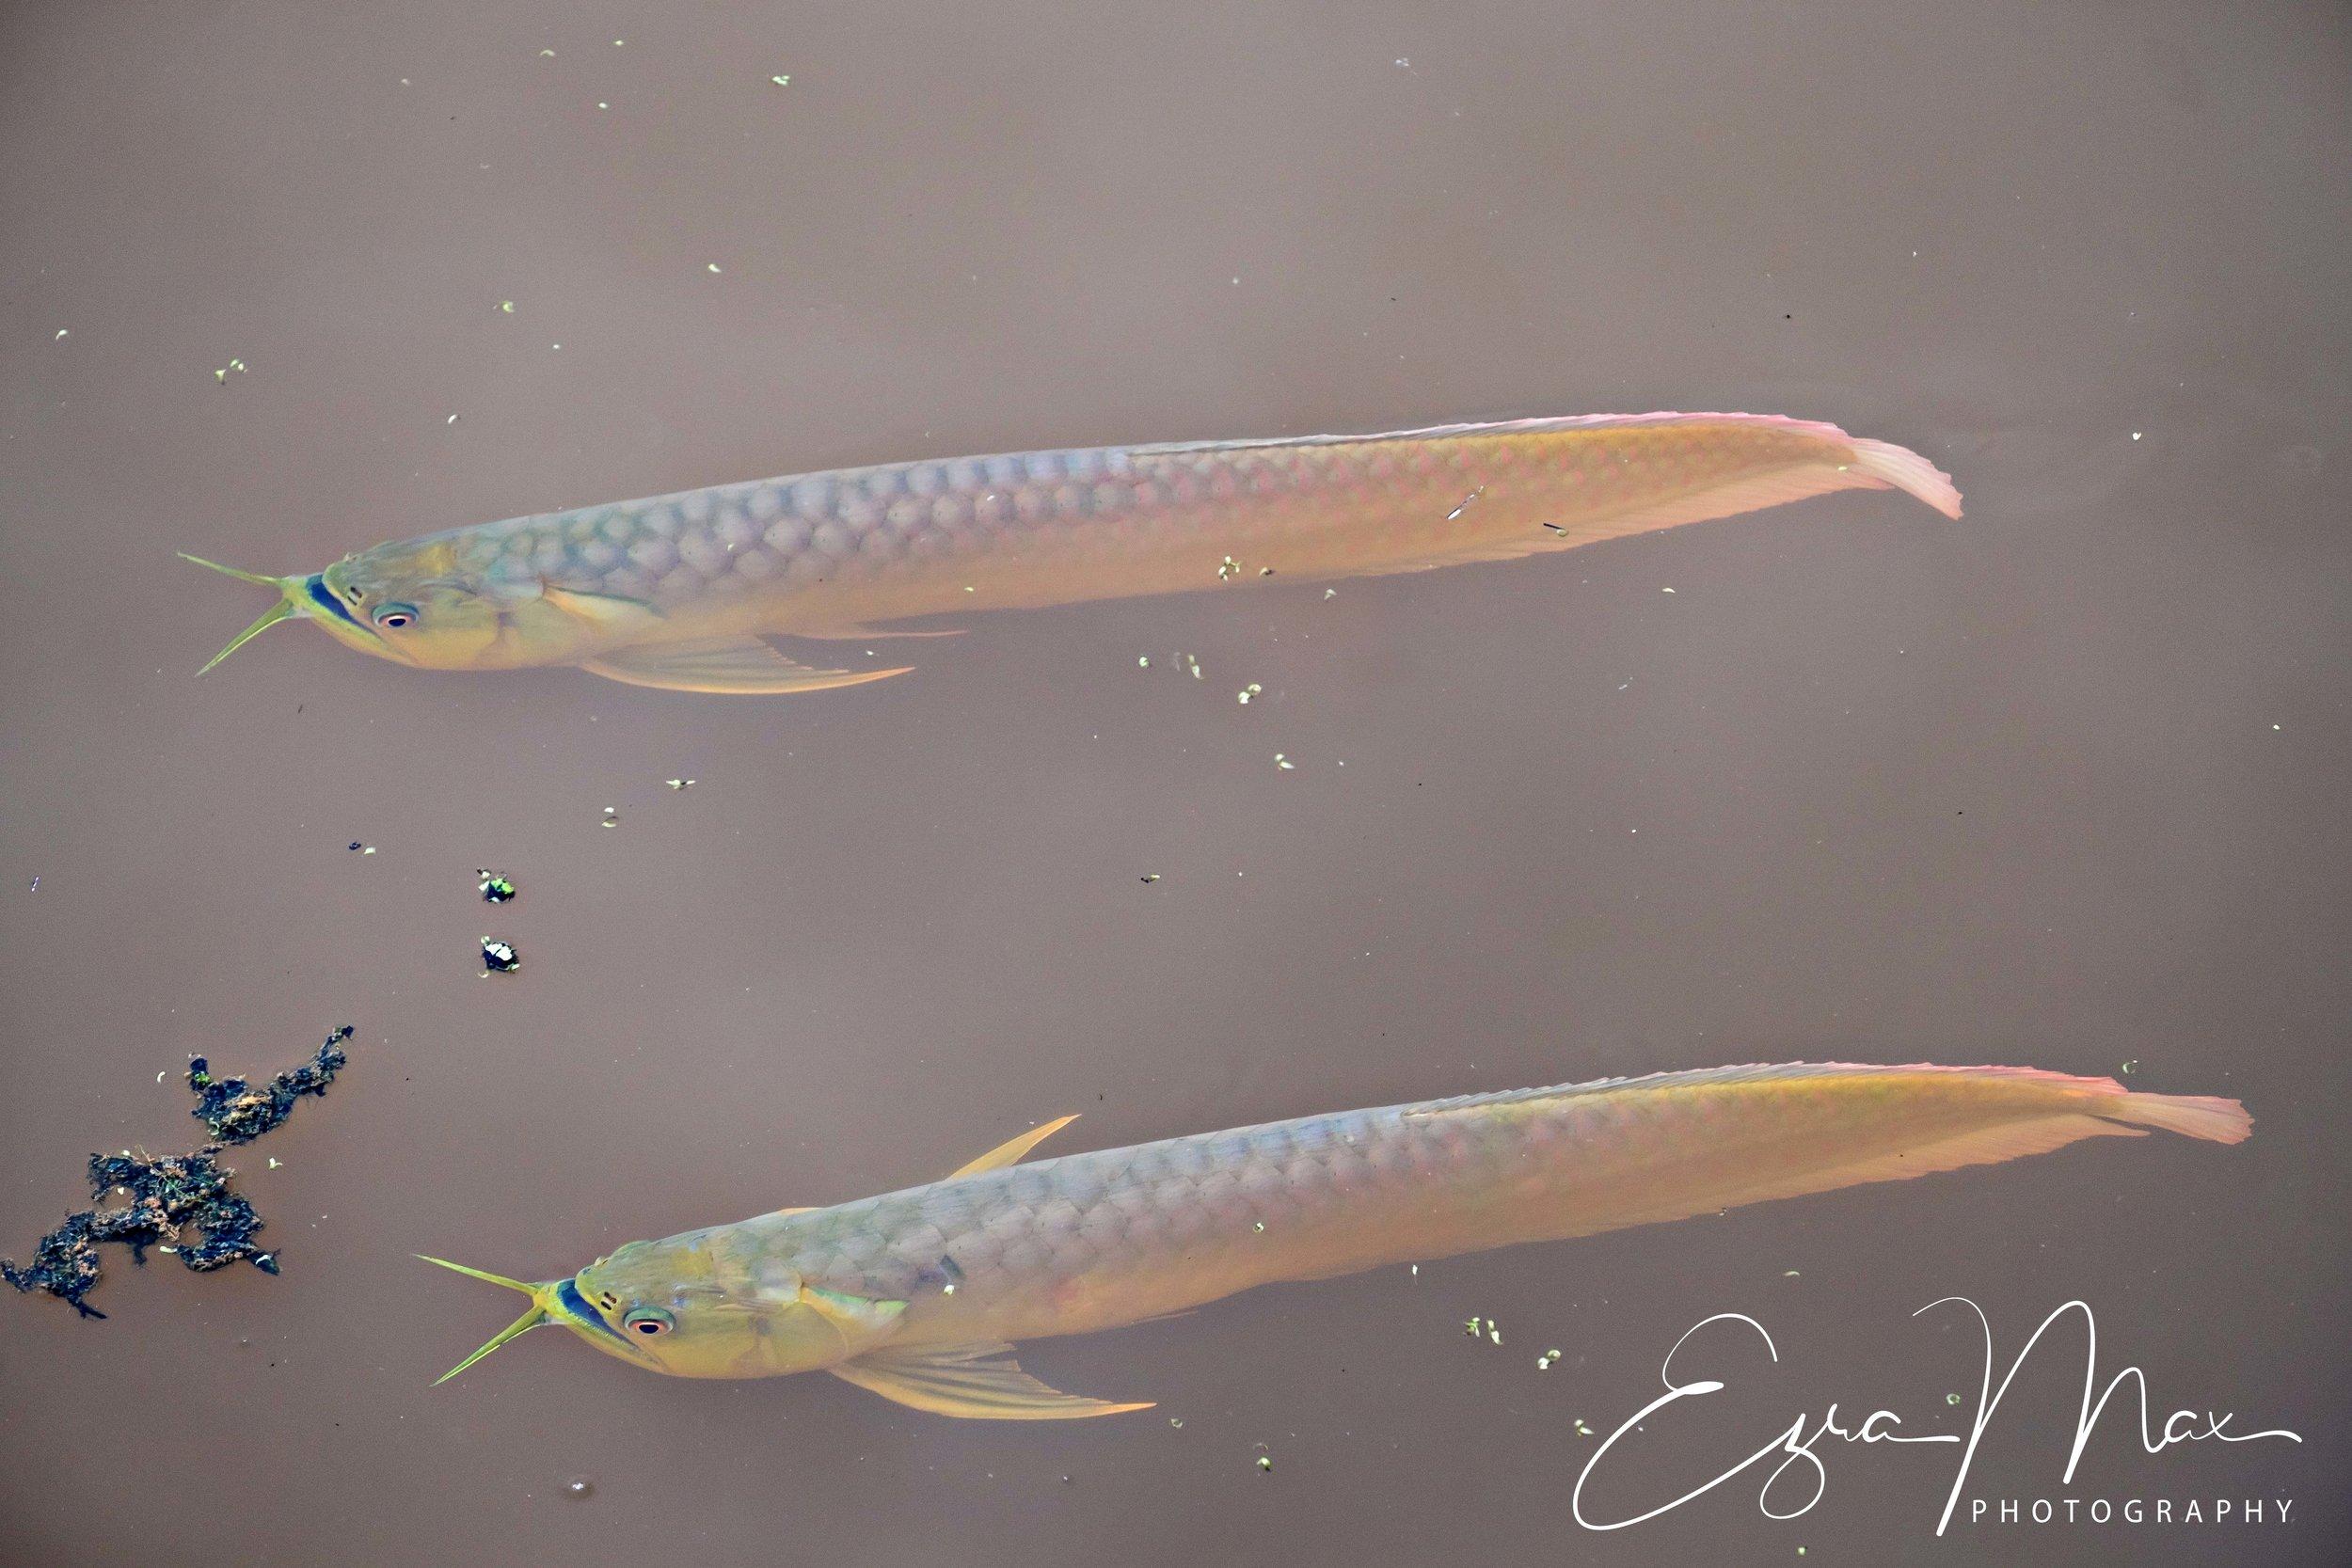 Two arowana swimming side by side